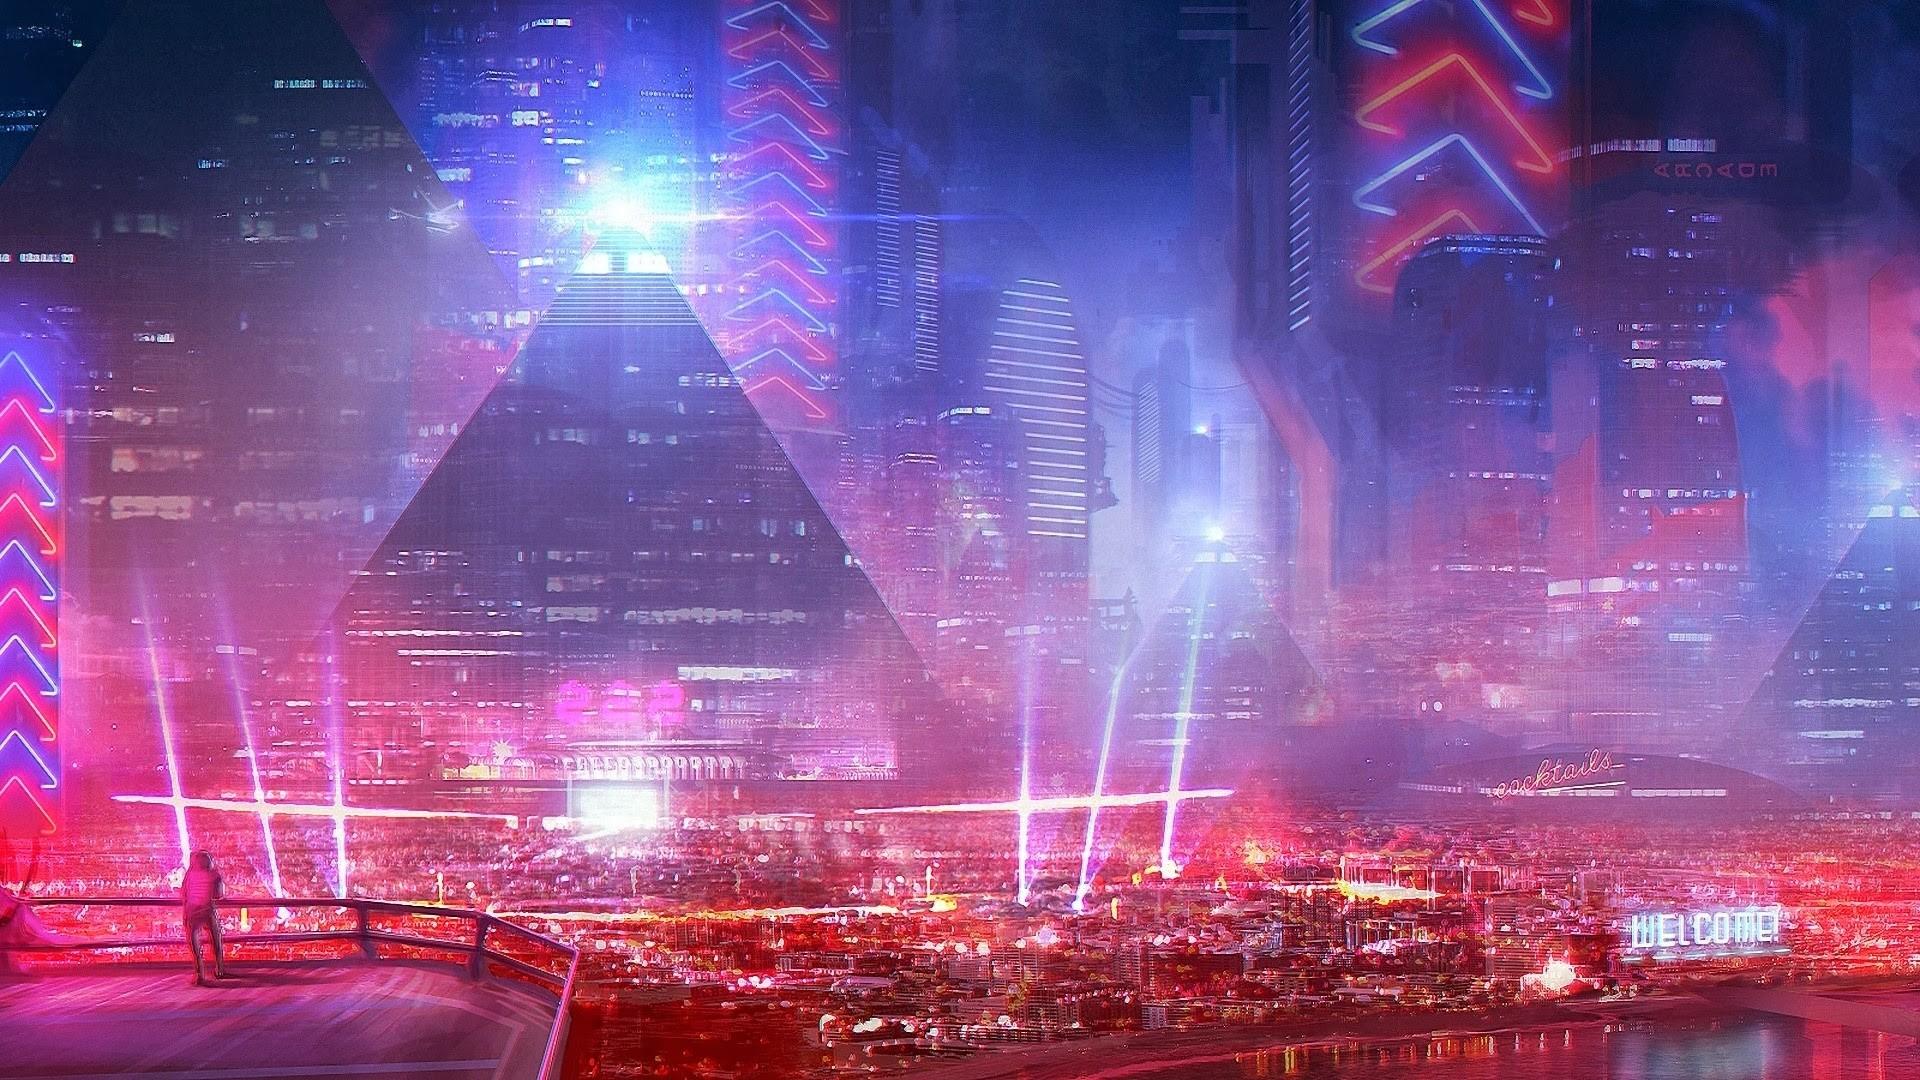 General 1920x1080 city cyberpunk science fiction futuristic city cityscape TheFatRat